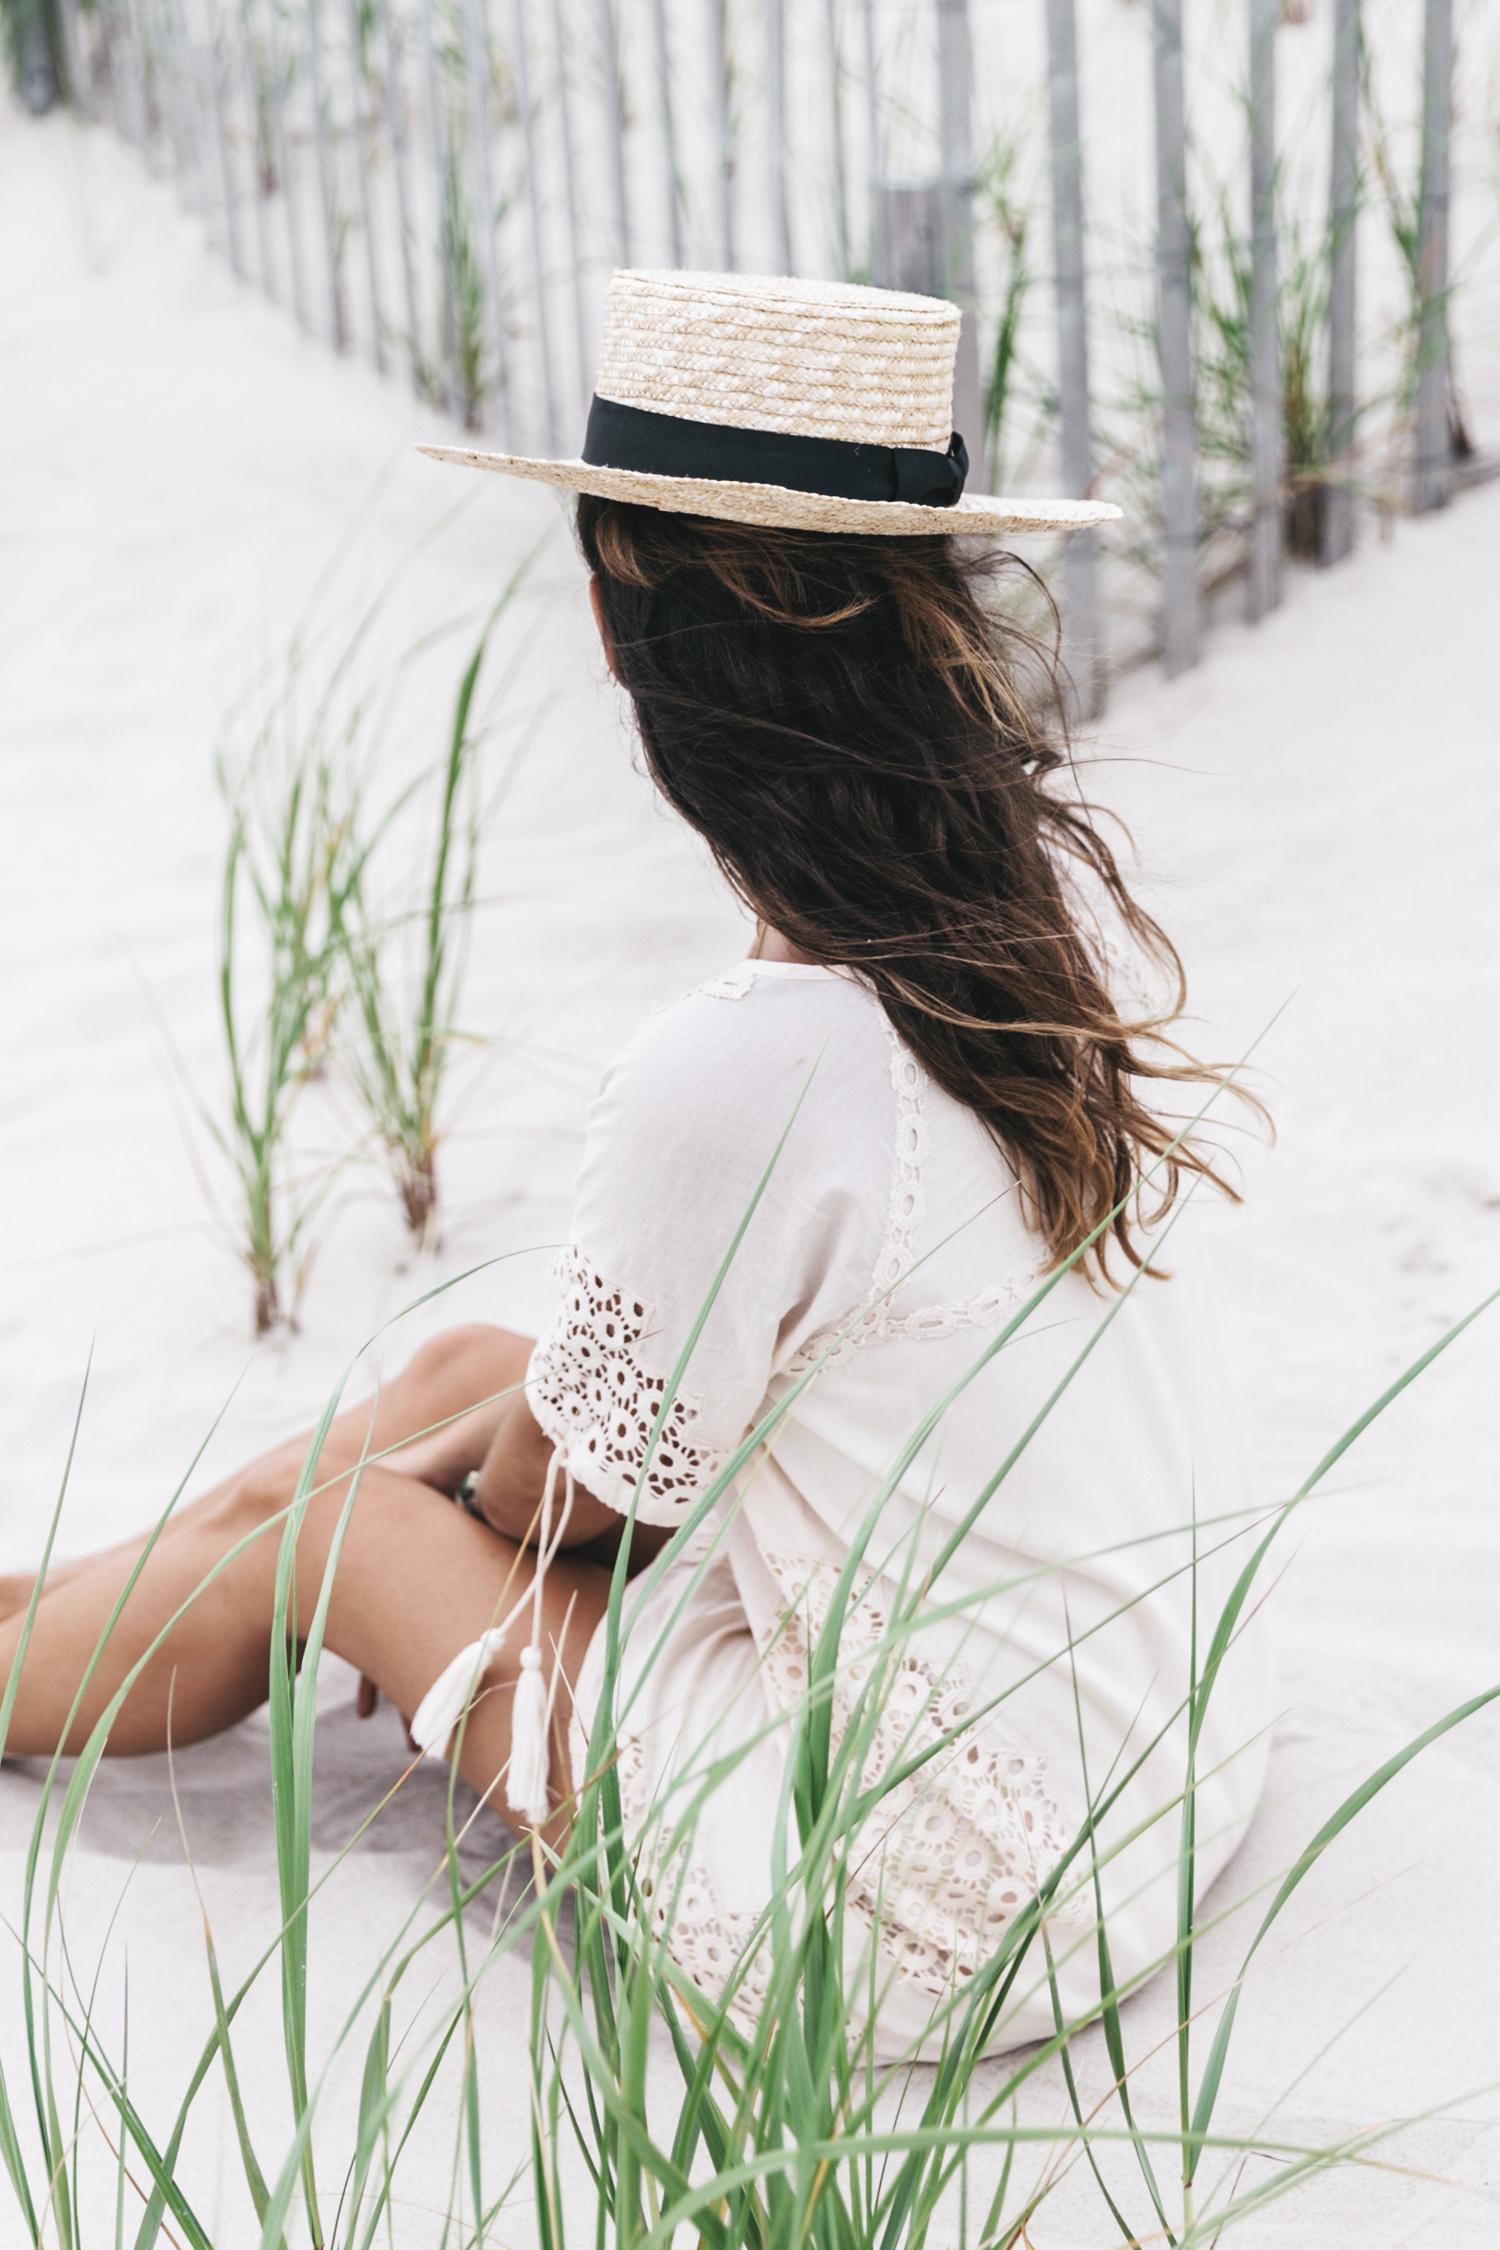 Revolve_in_The_Hamptons-Revolve_Clothing-Collage_Vintage-Cream_Dress-Tularosa-Canotier-72